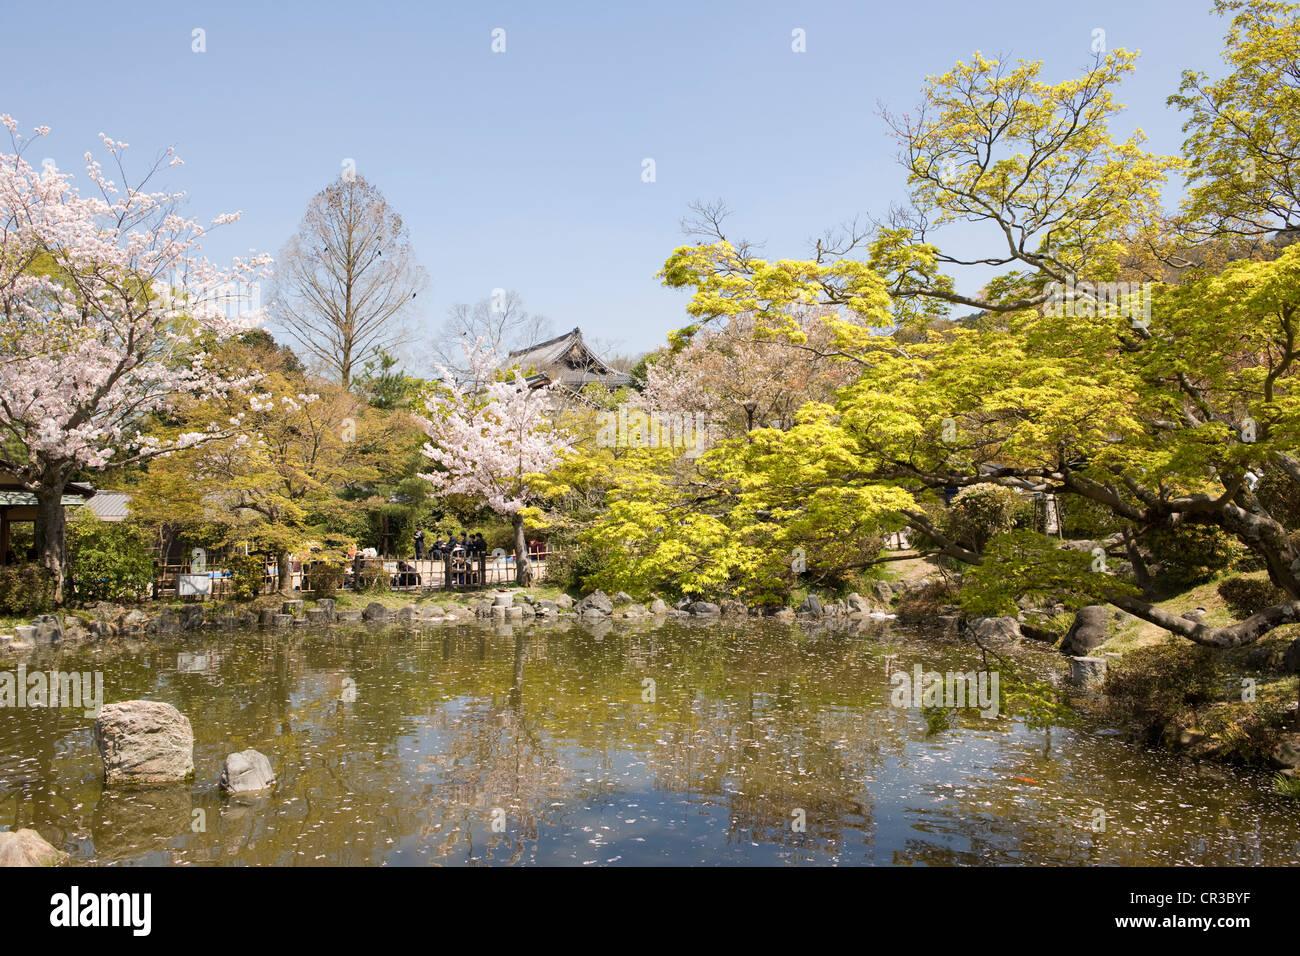 Japan, Honshu Island, Kinki Region, city of Kyoto, Maruyama Park at spring Stock Photo